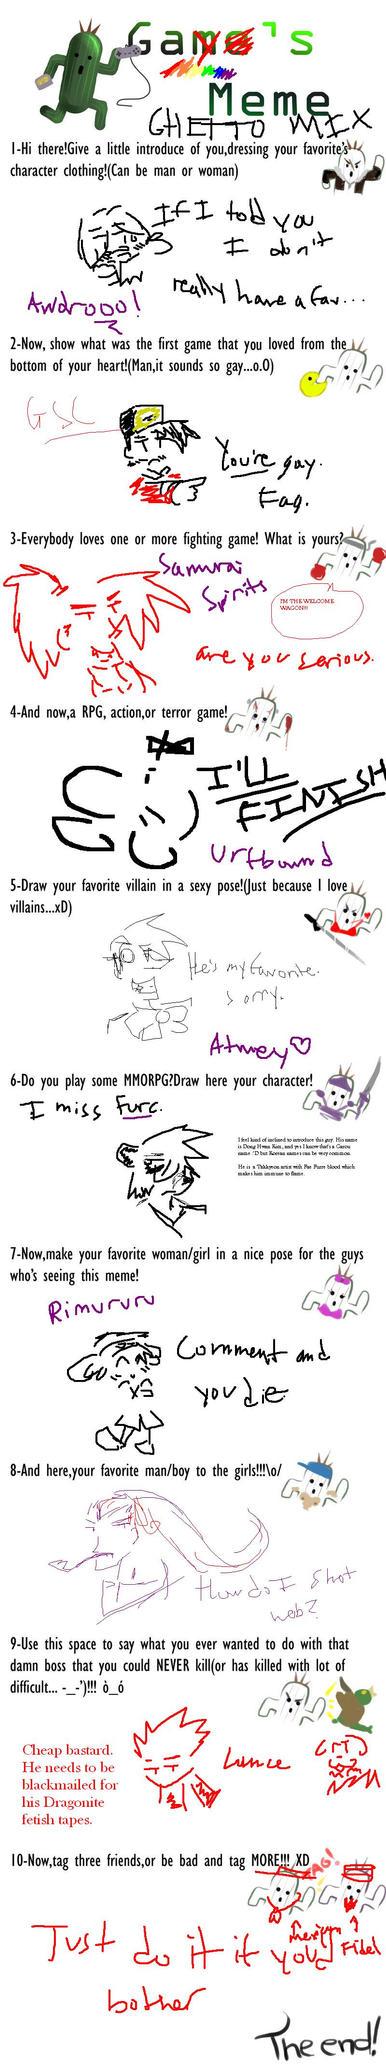 stupid game meme by GringoLee